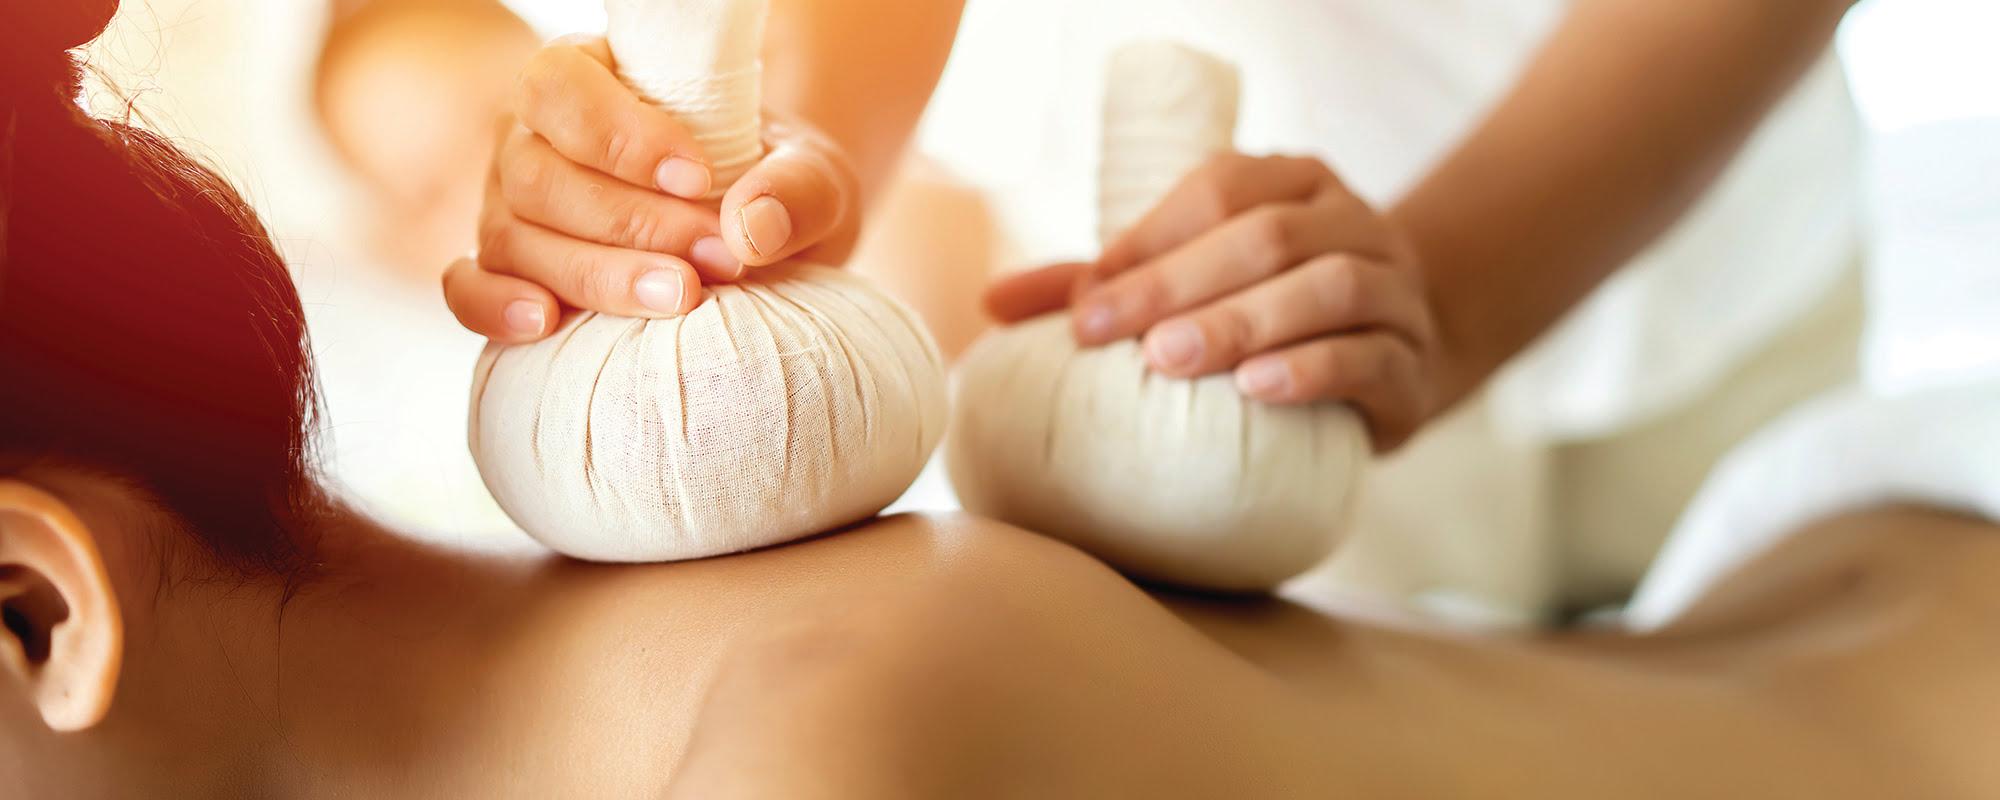 Masaj Compress Herbal Thai Therapy